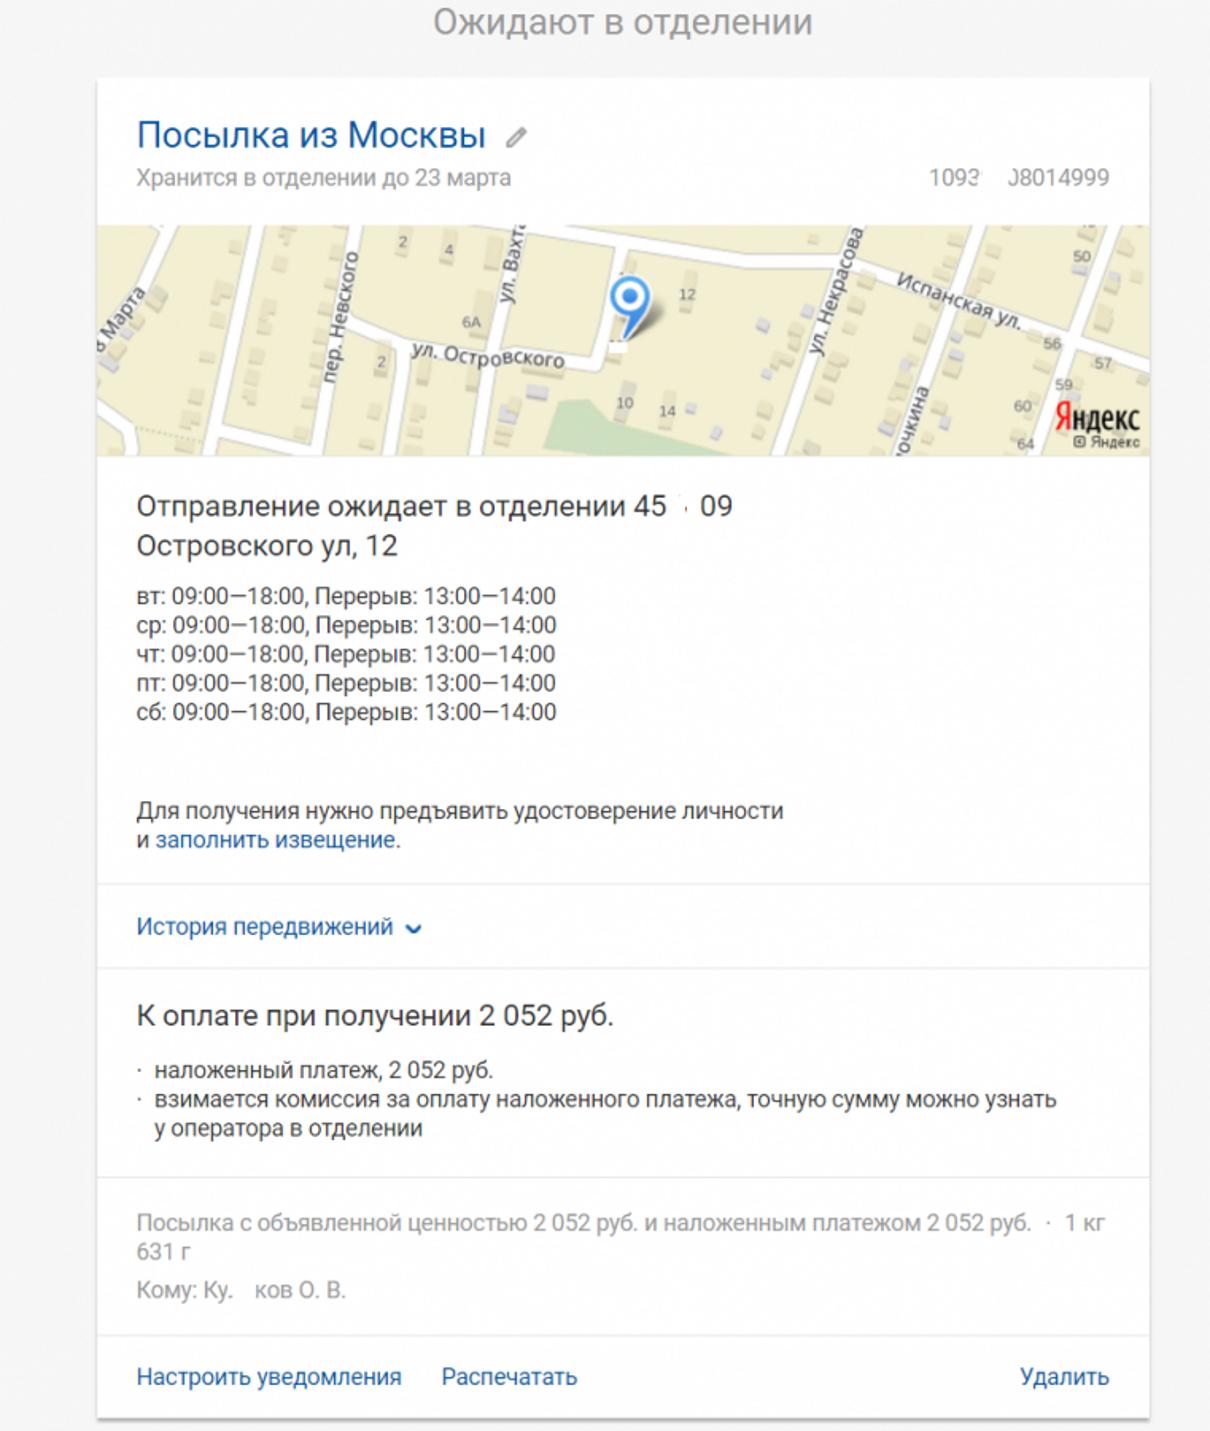 Жалоба-отзыв: Nail-sales.ru - Хамло с угрозами.  Фото №1